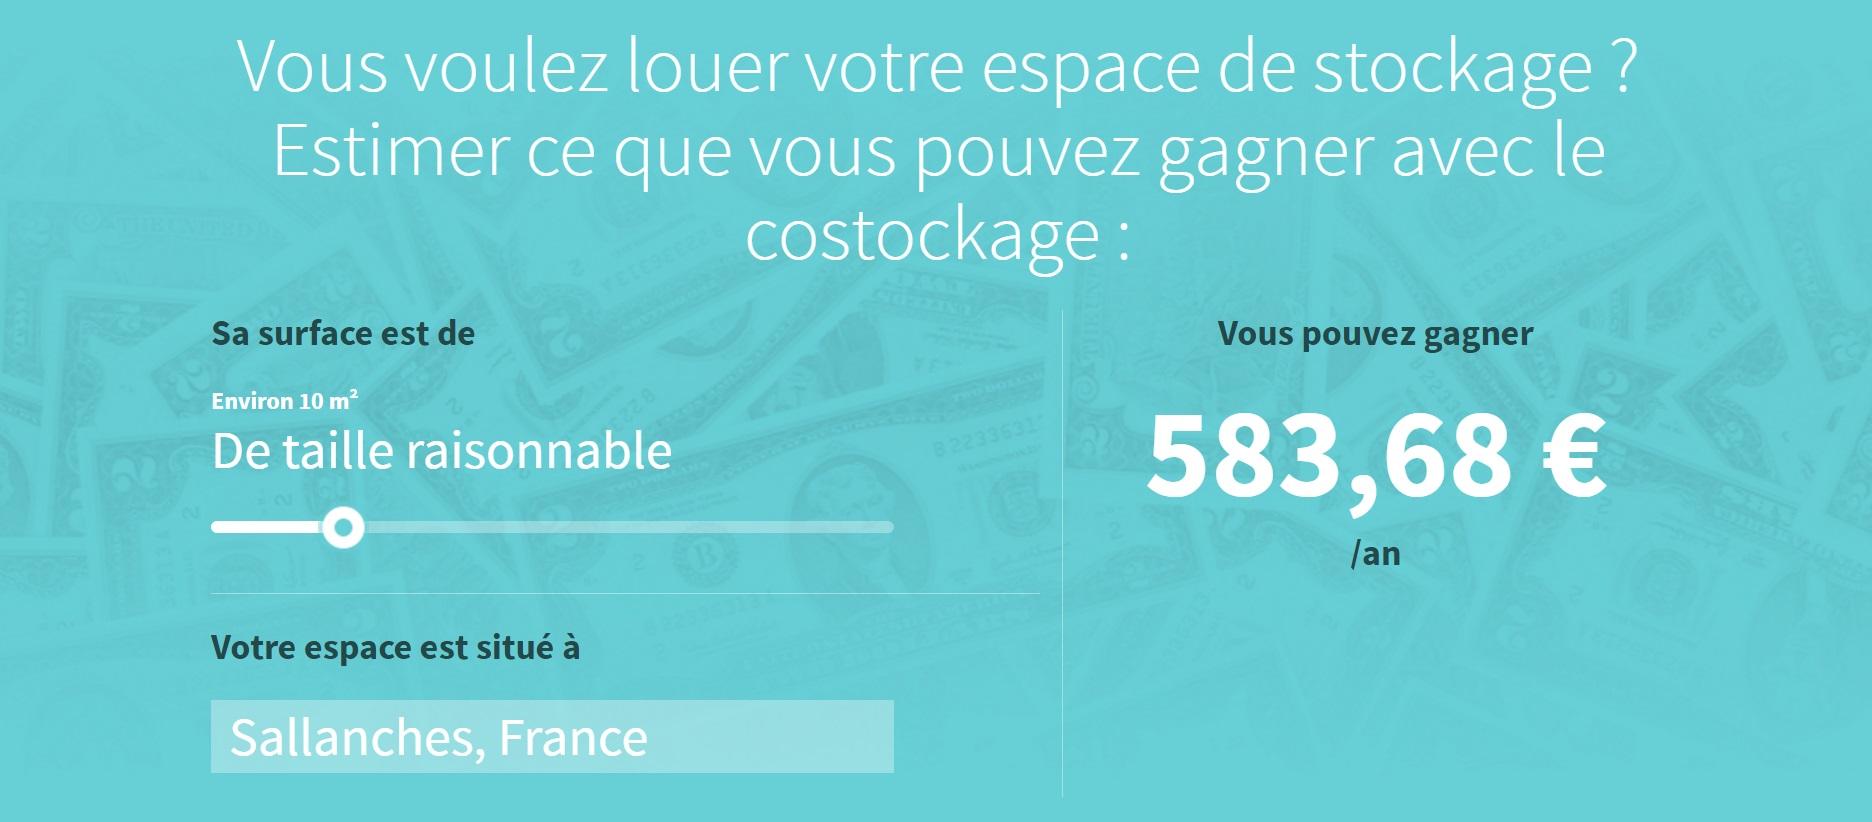 Calculateur de tarif despace de stockage sur OuiStock